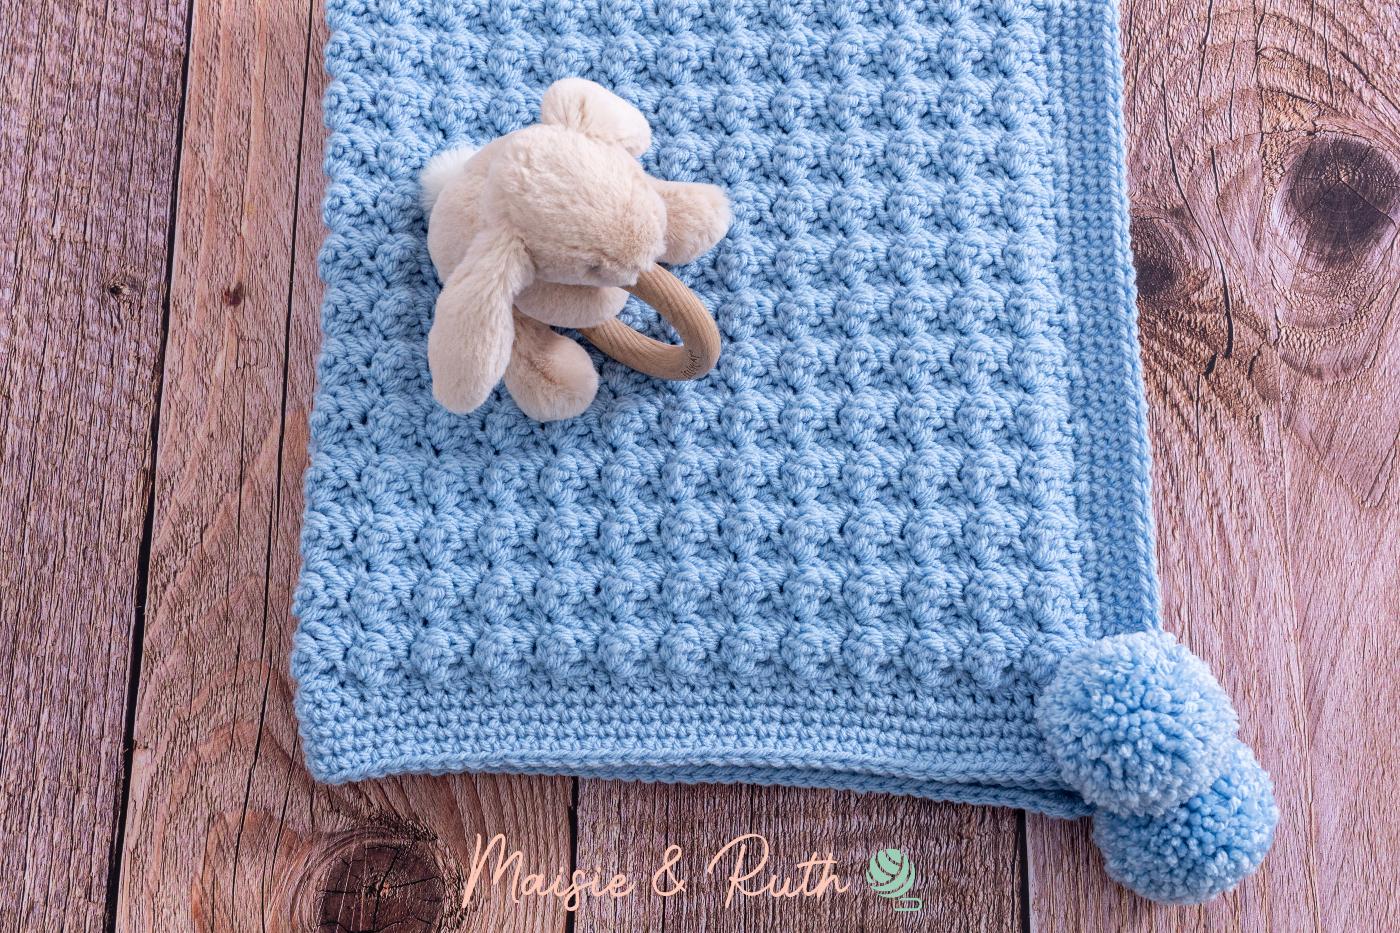 Easy Crochet Baby Blanket on wood table